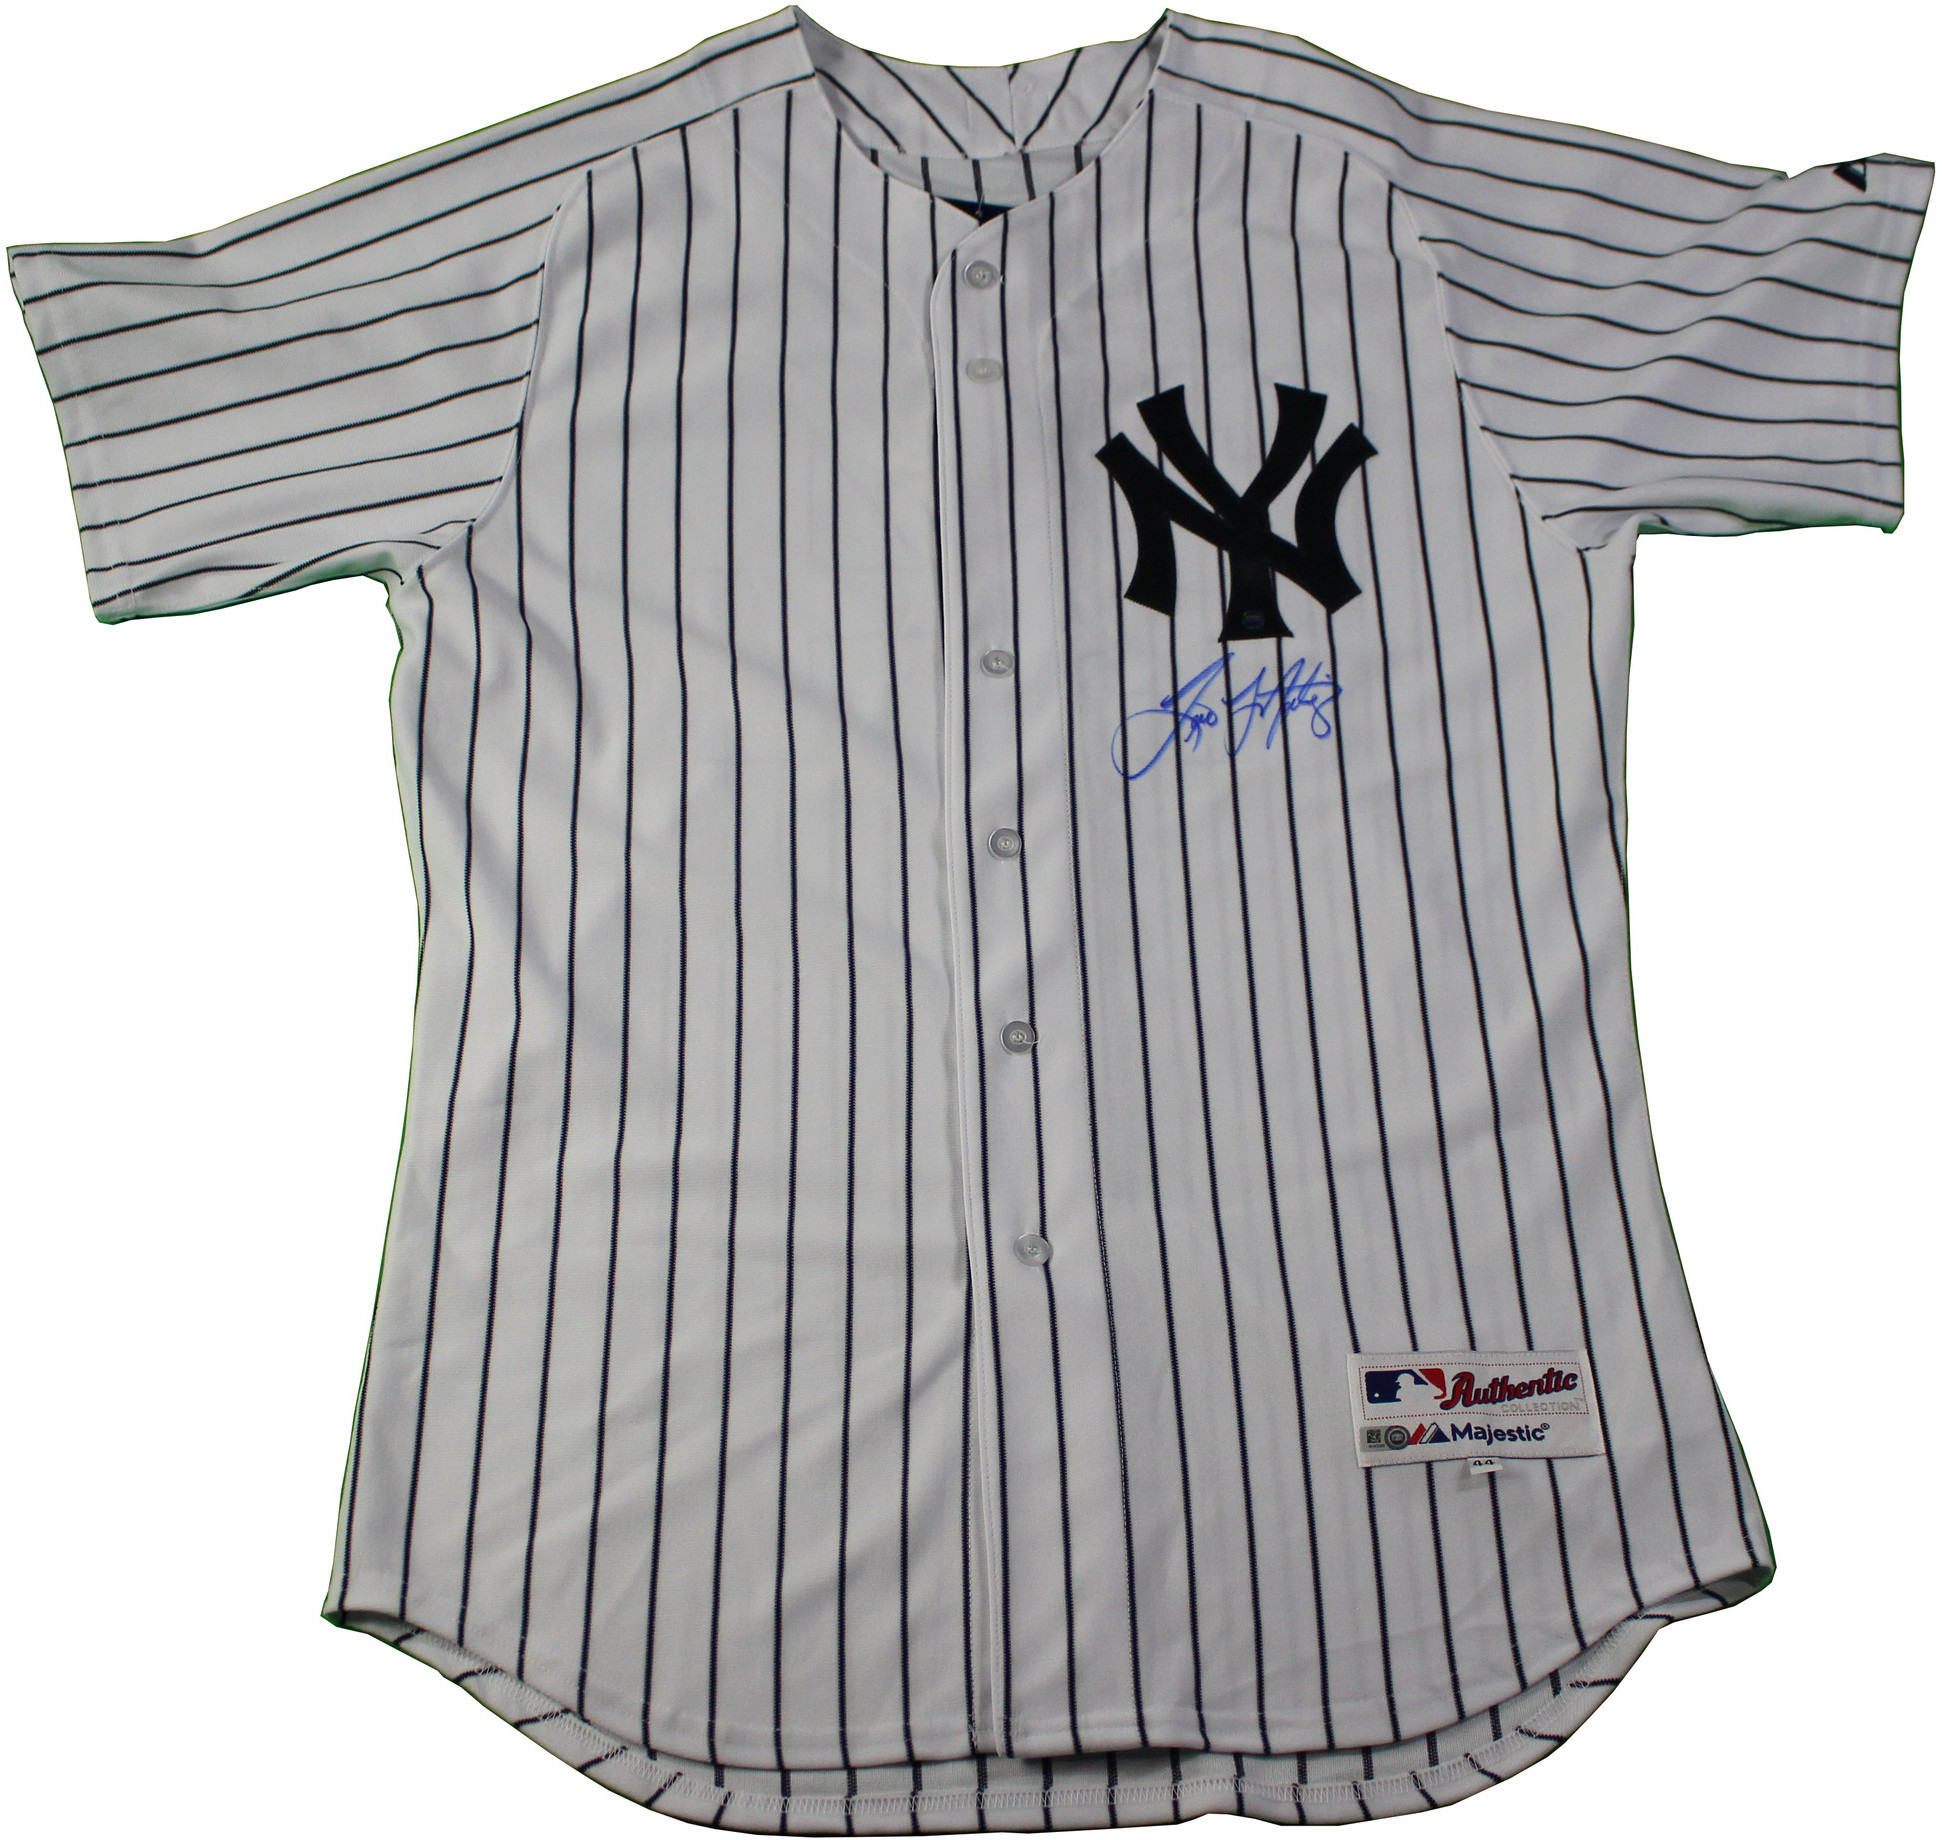 Tino Martinez Signed New York Yankees 24 Authentic Pinstripe Jersey